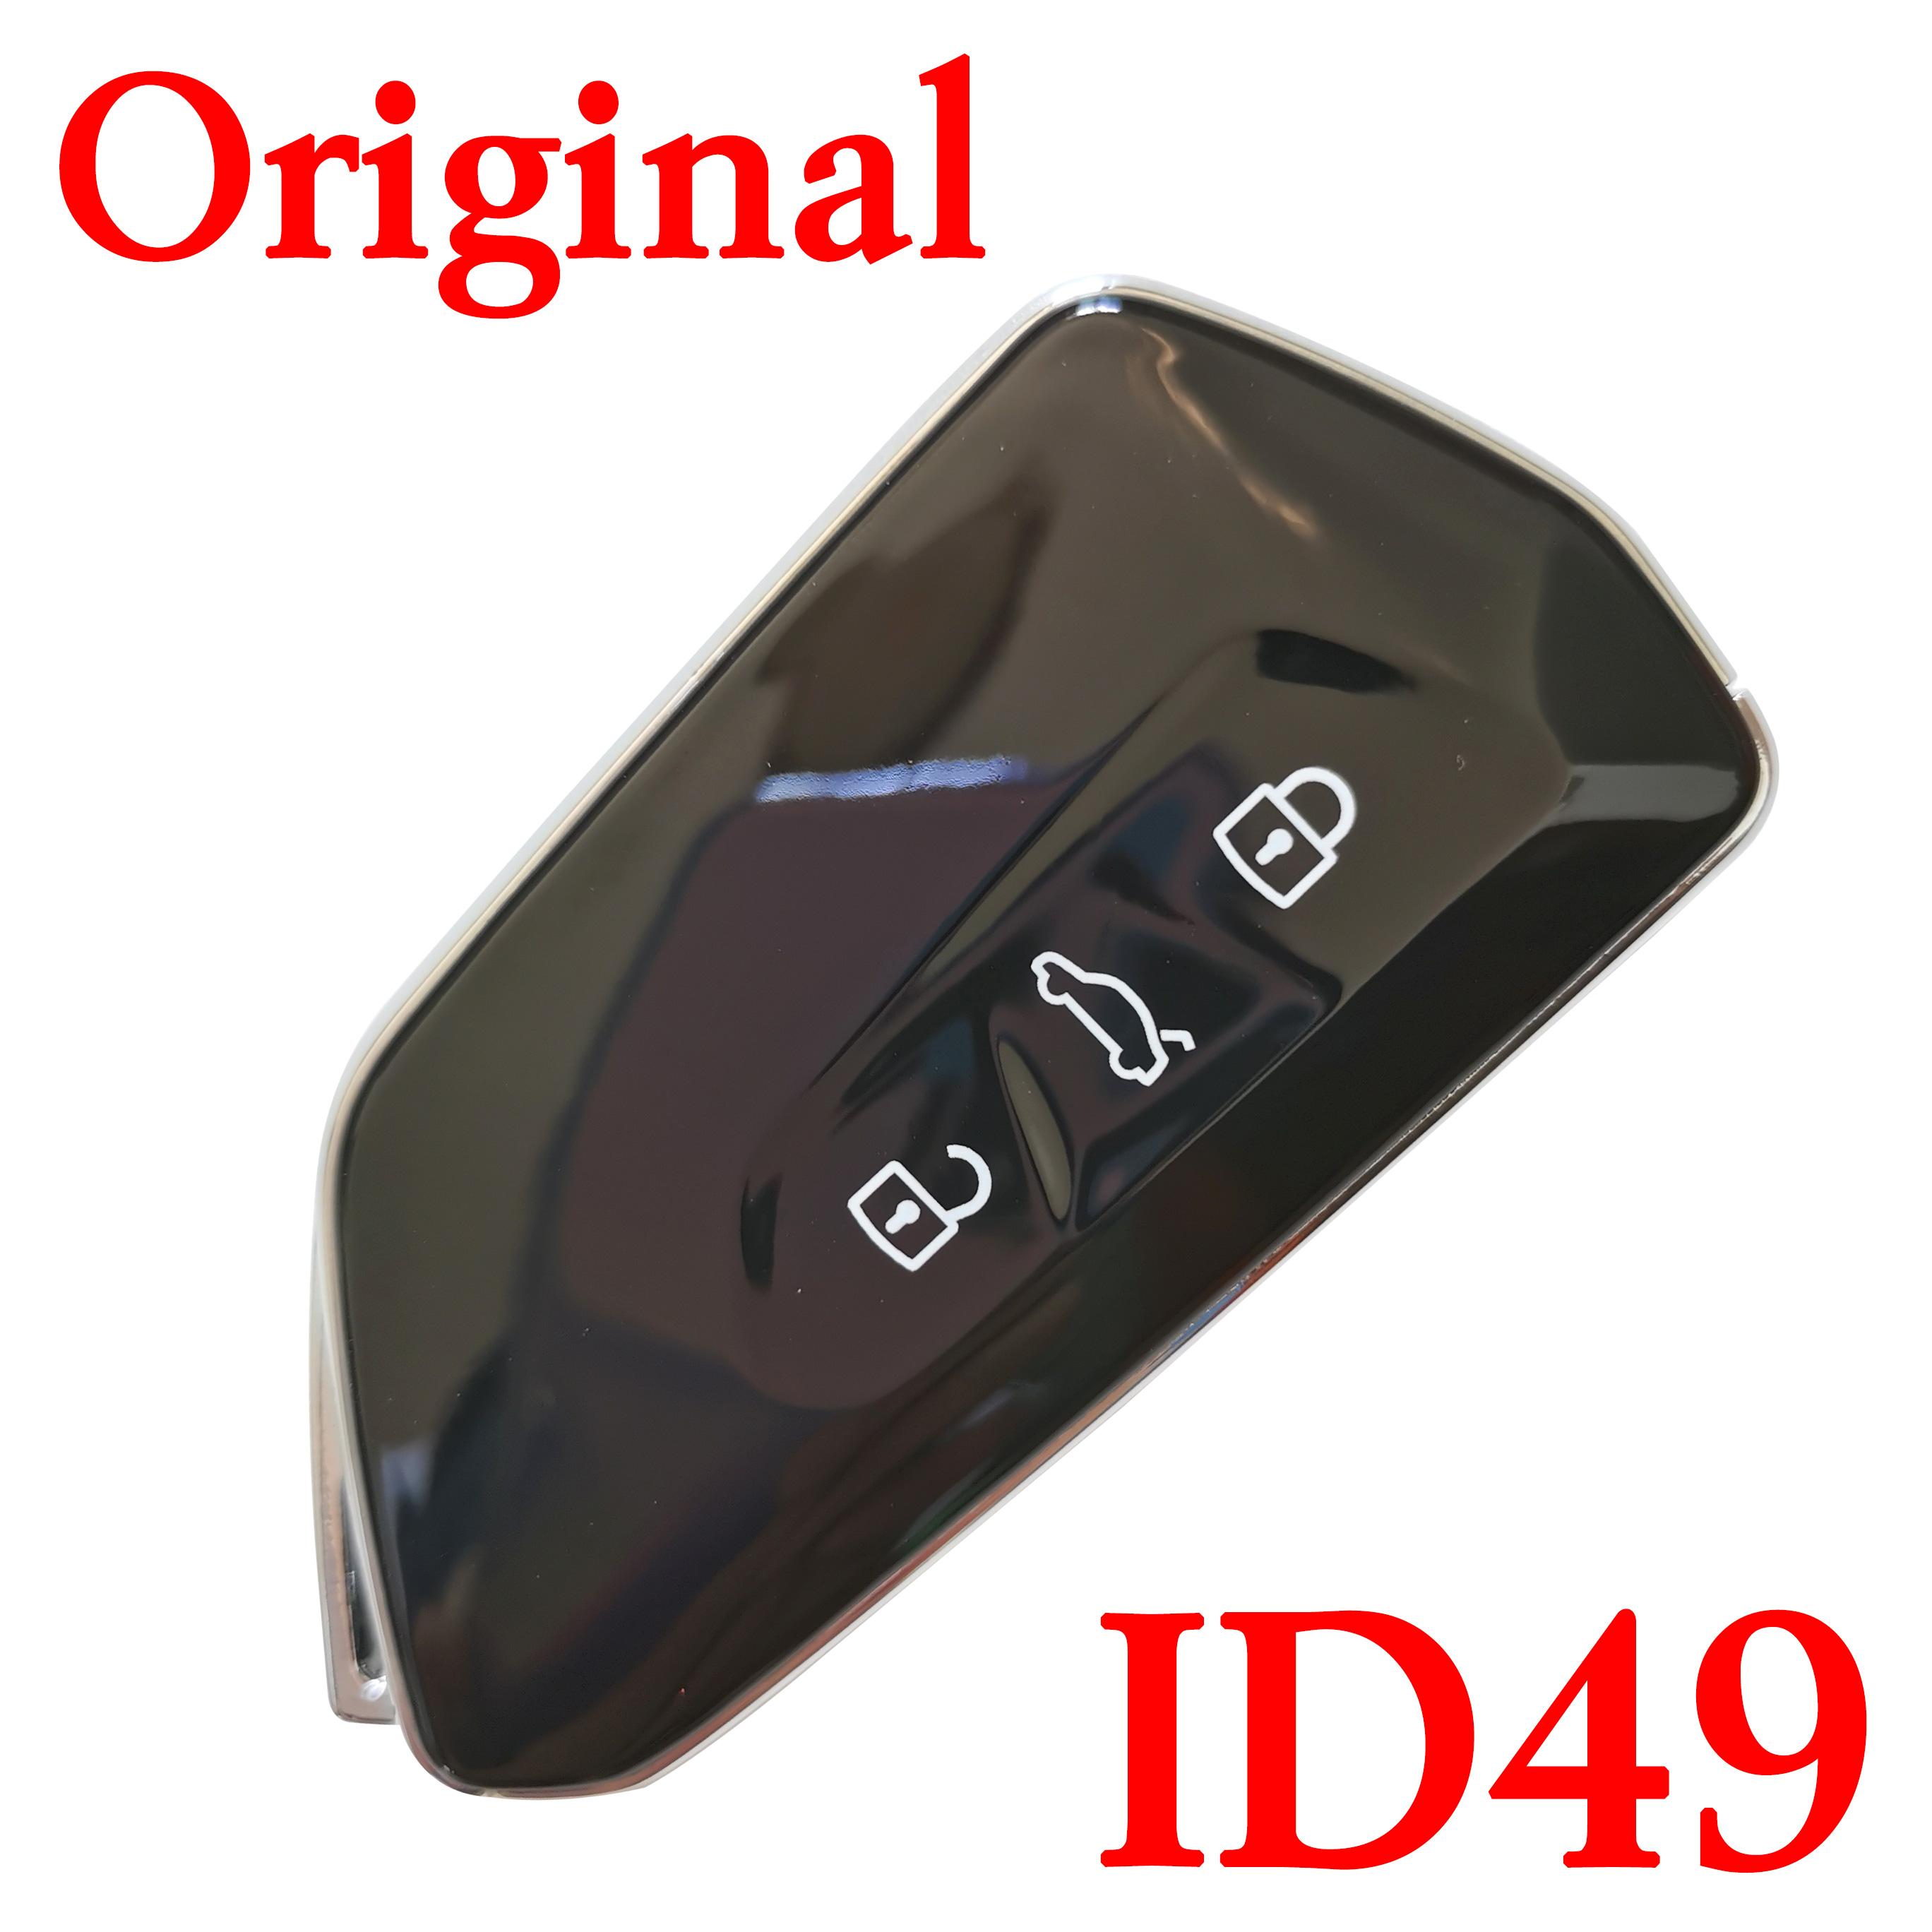 Original 3 Buttons 434 MHz Smart Proximity Key for Skoda - ID49